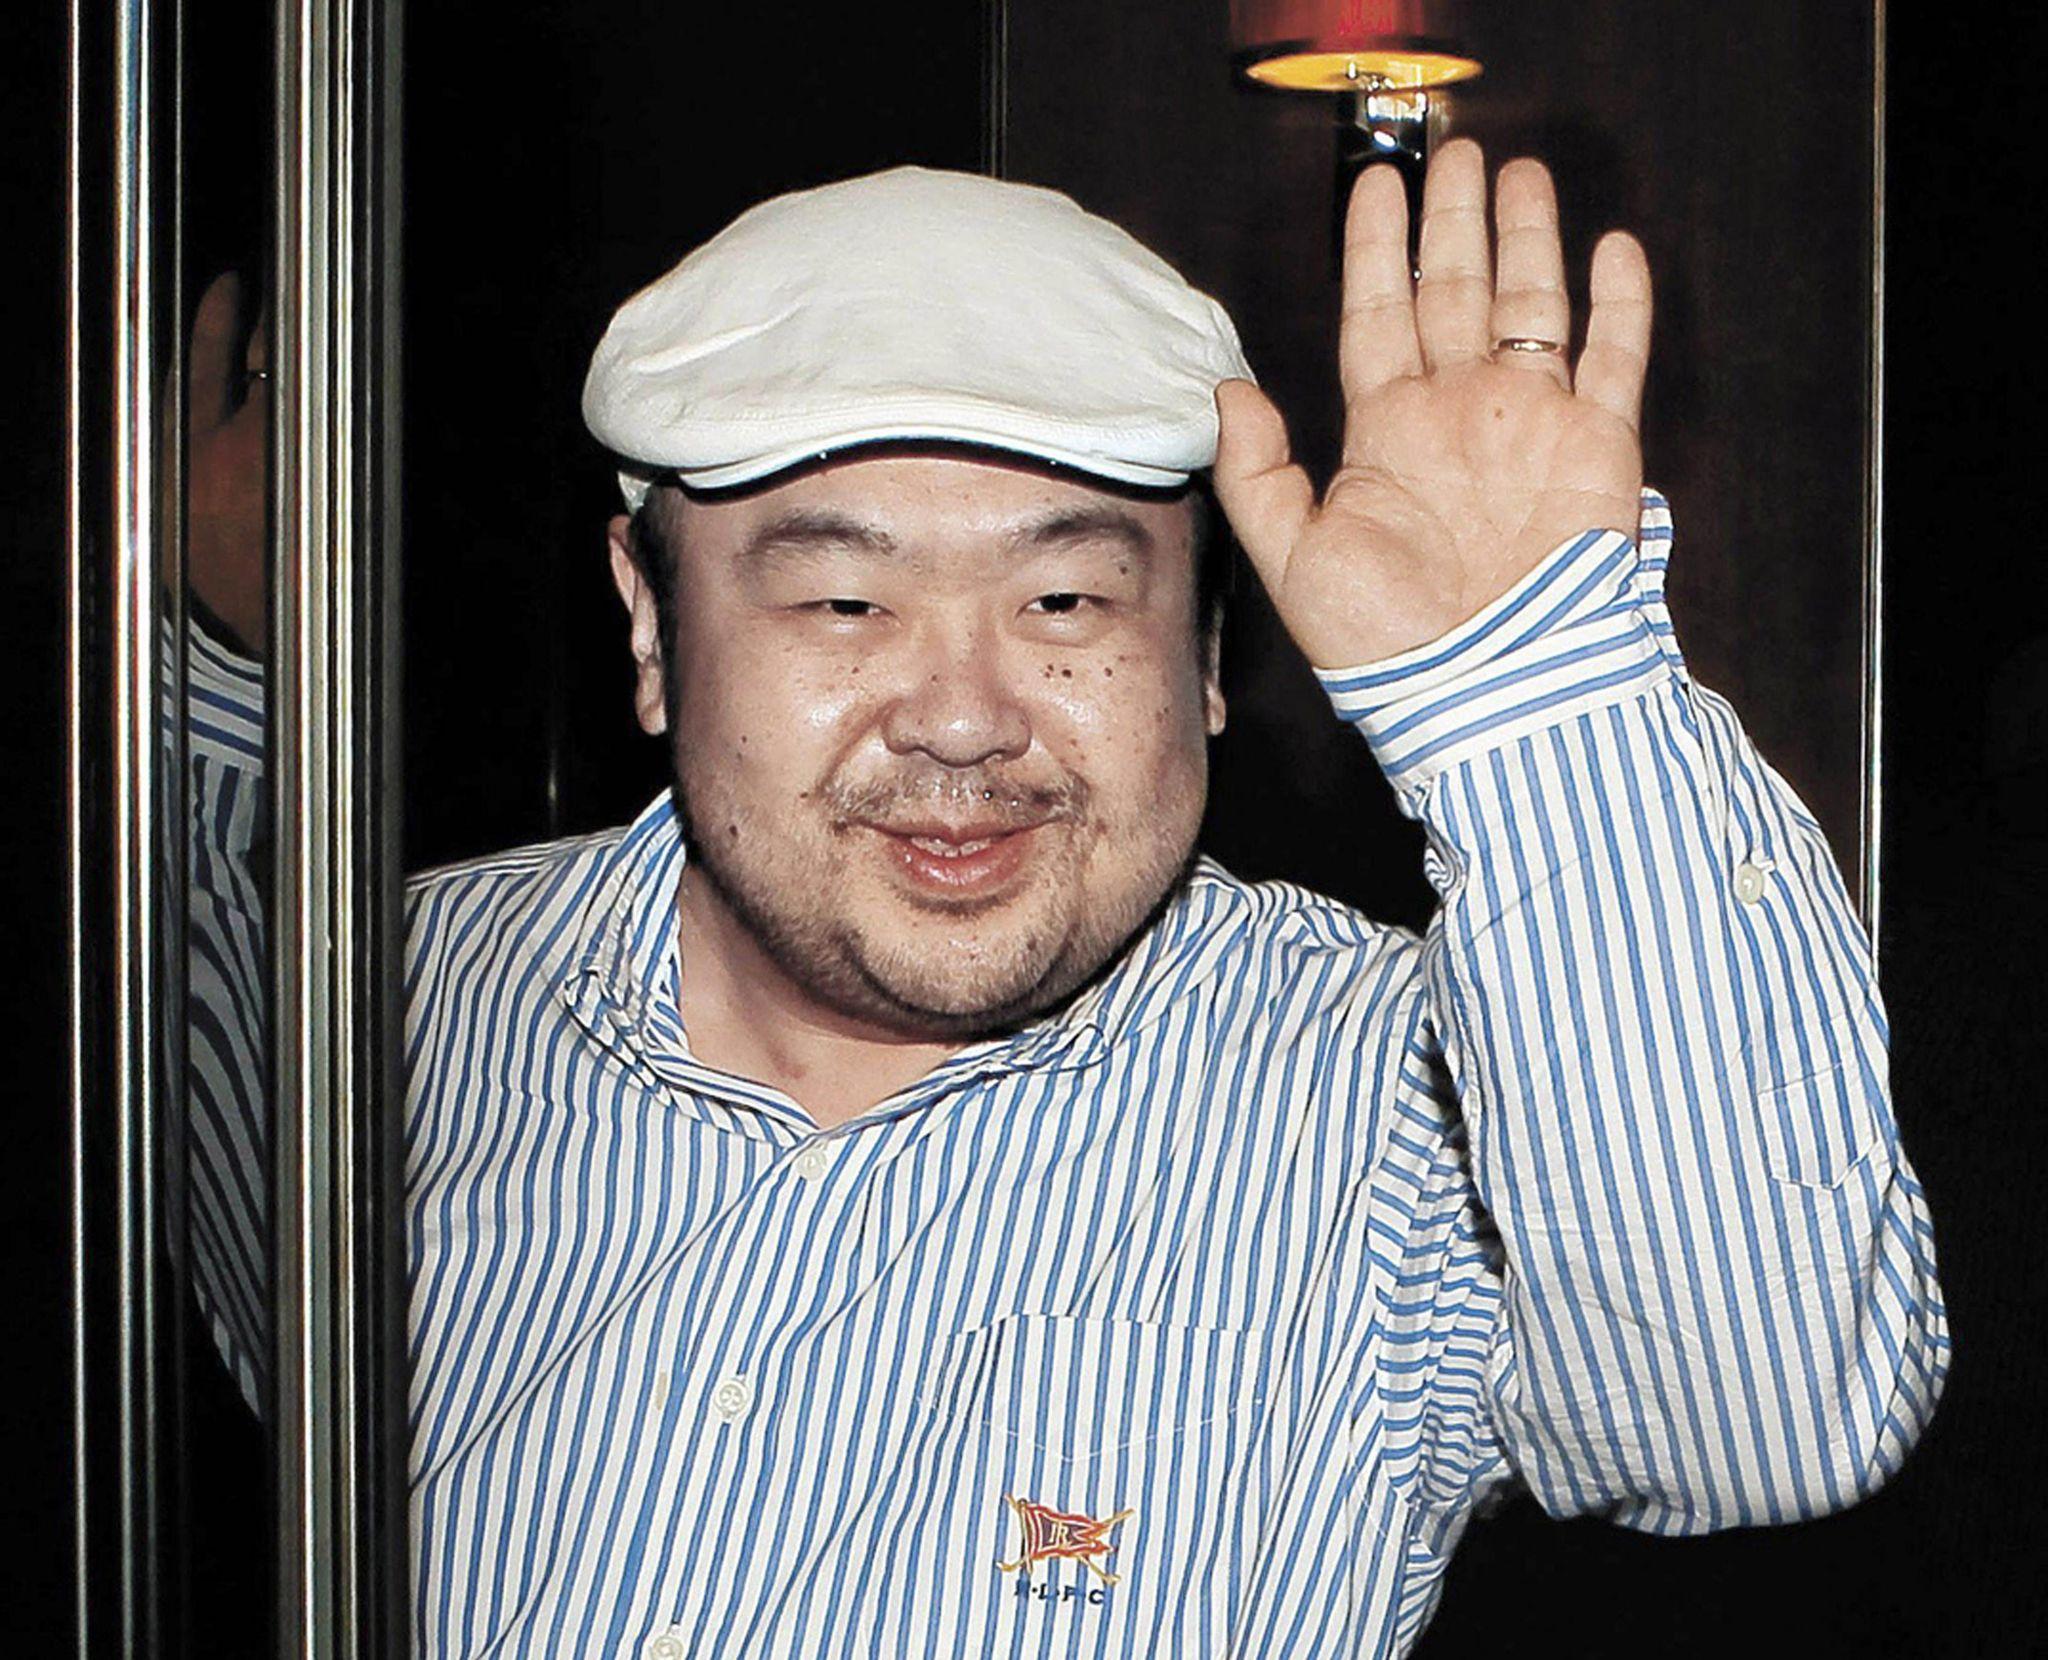 Kim Jong-nam was CIA informant: Report